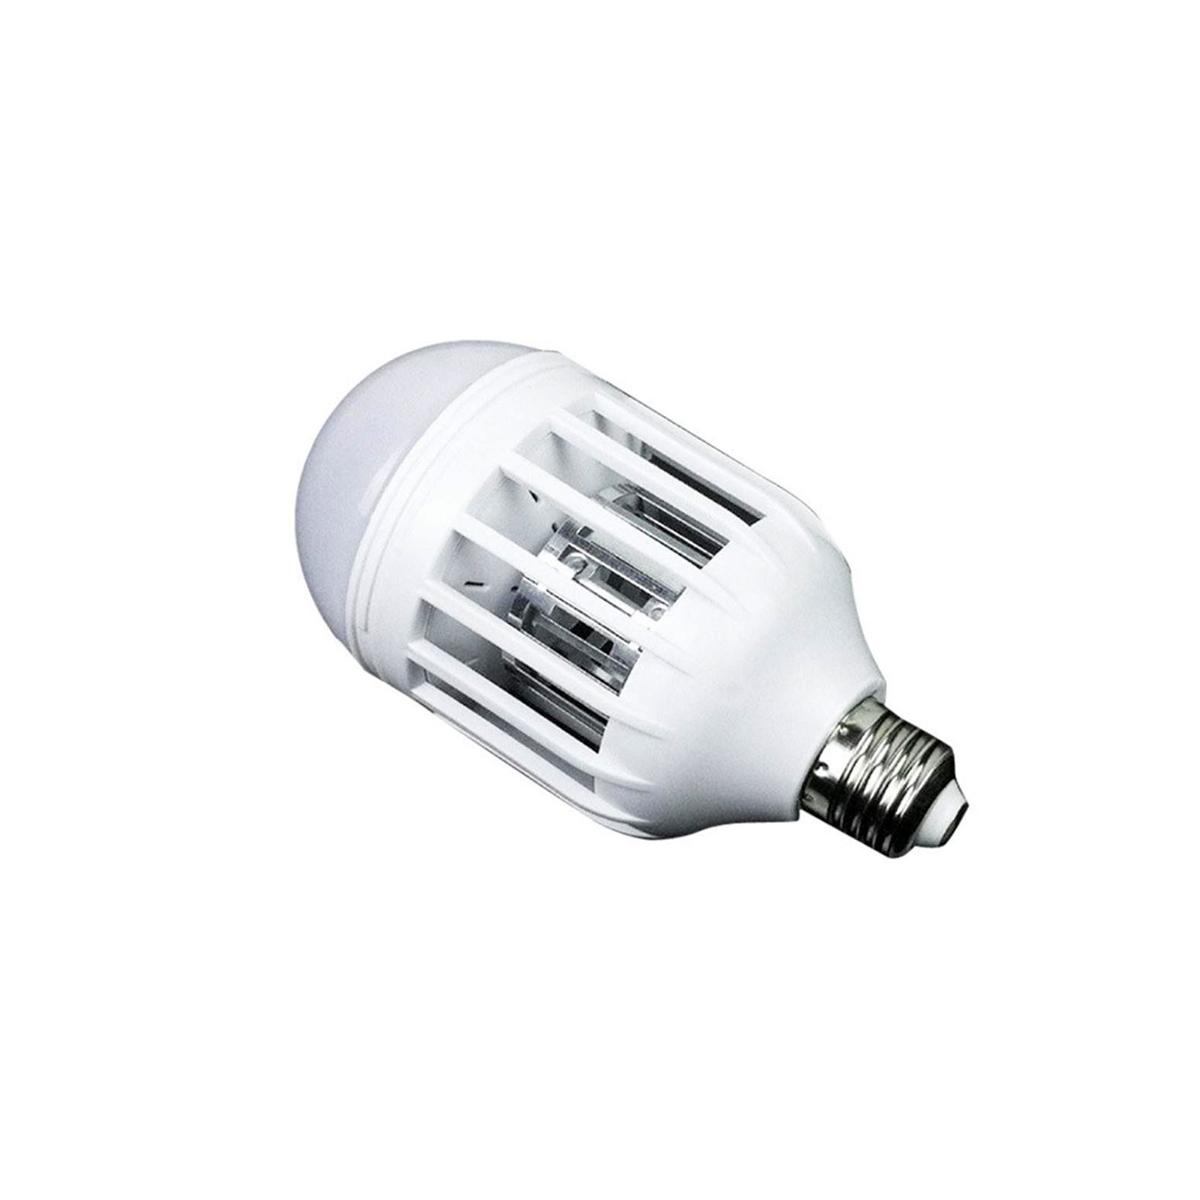 IAG-Bug-Zapper-Light-Bulb-1-1200×1200